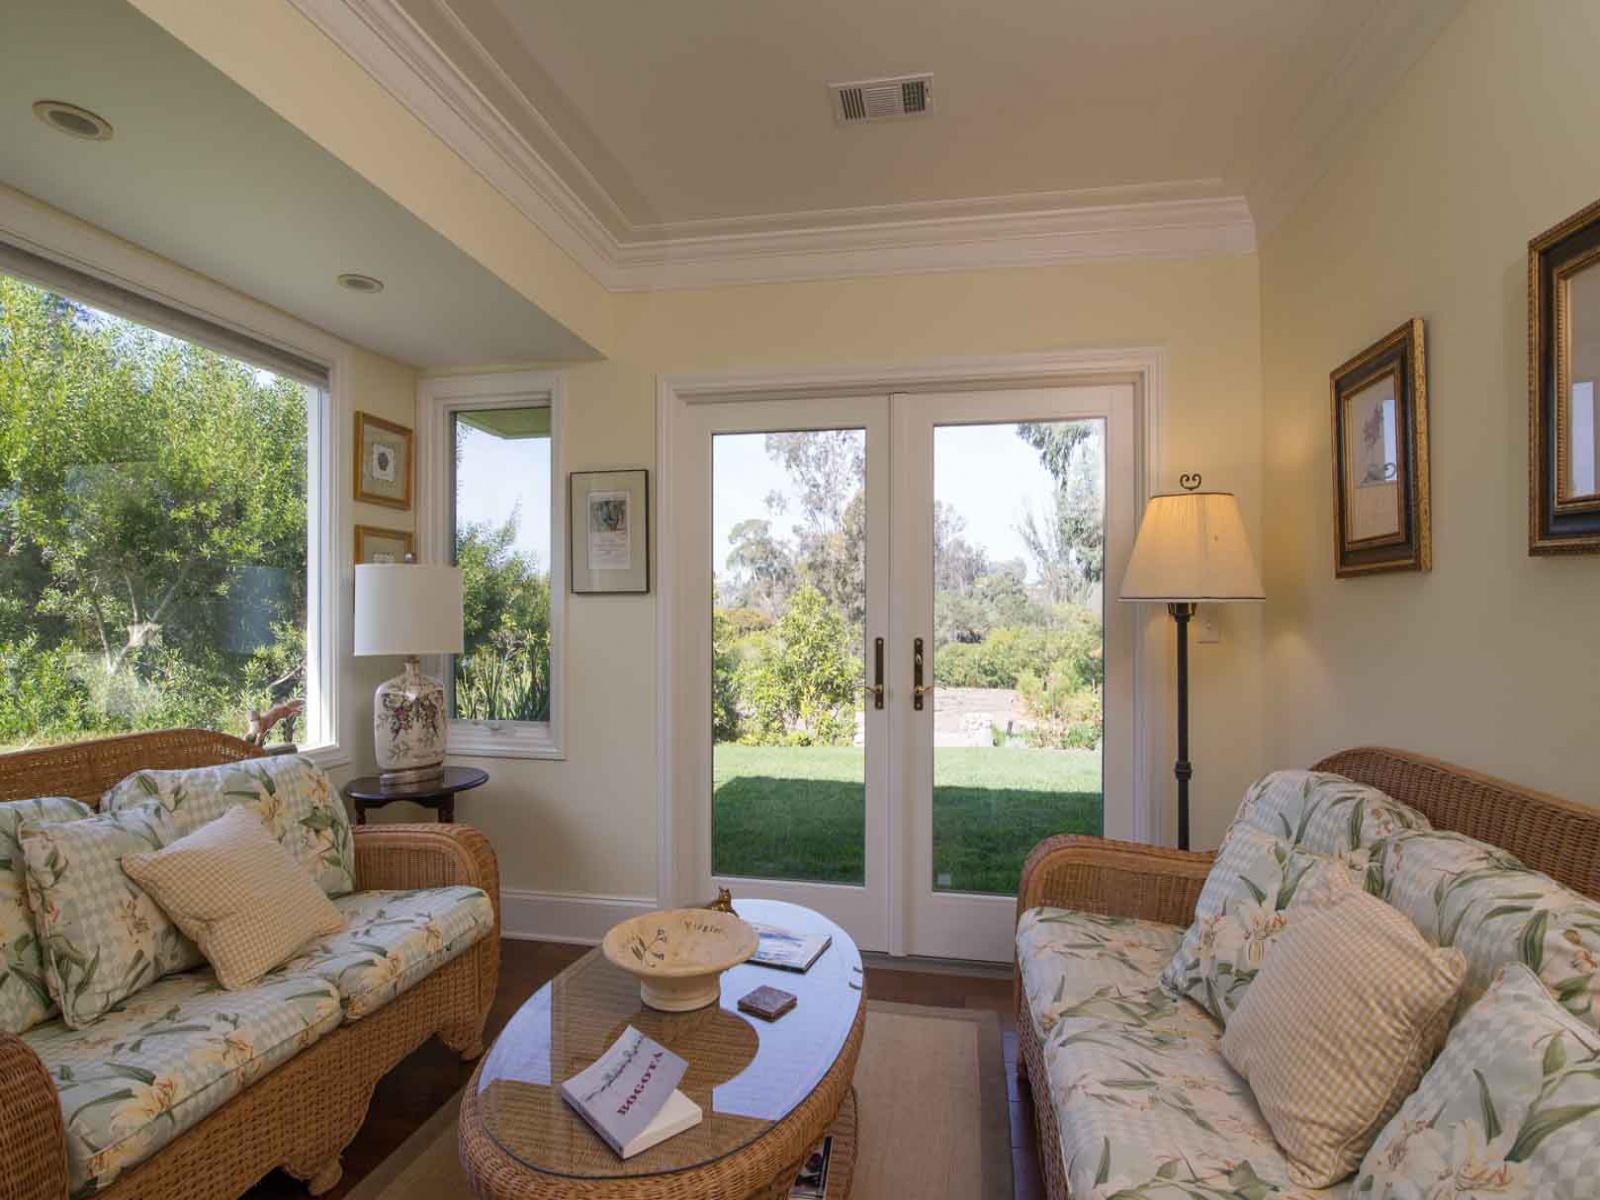 17038 Mimosa,Rancho Santa Fe,California 92067,House,Mimosa,1007